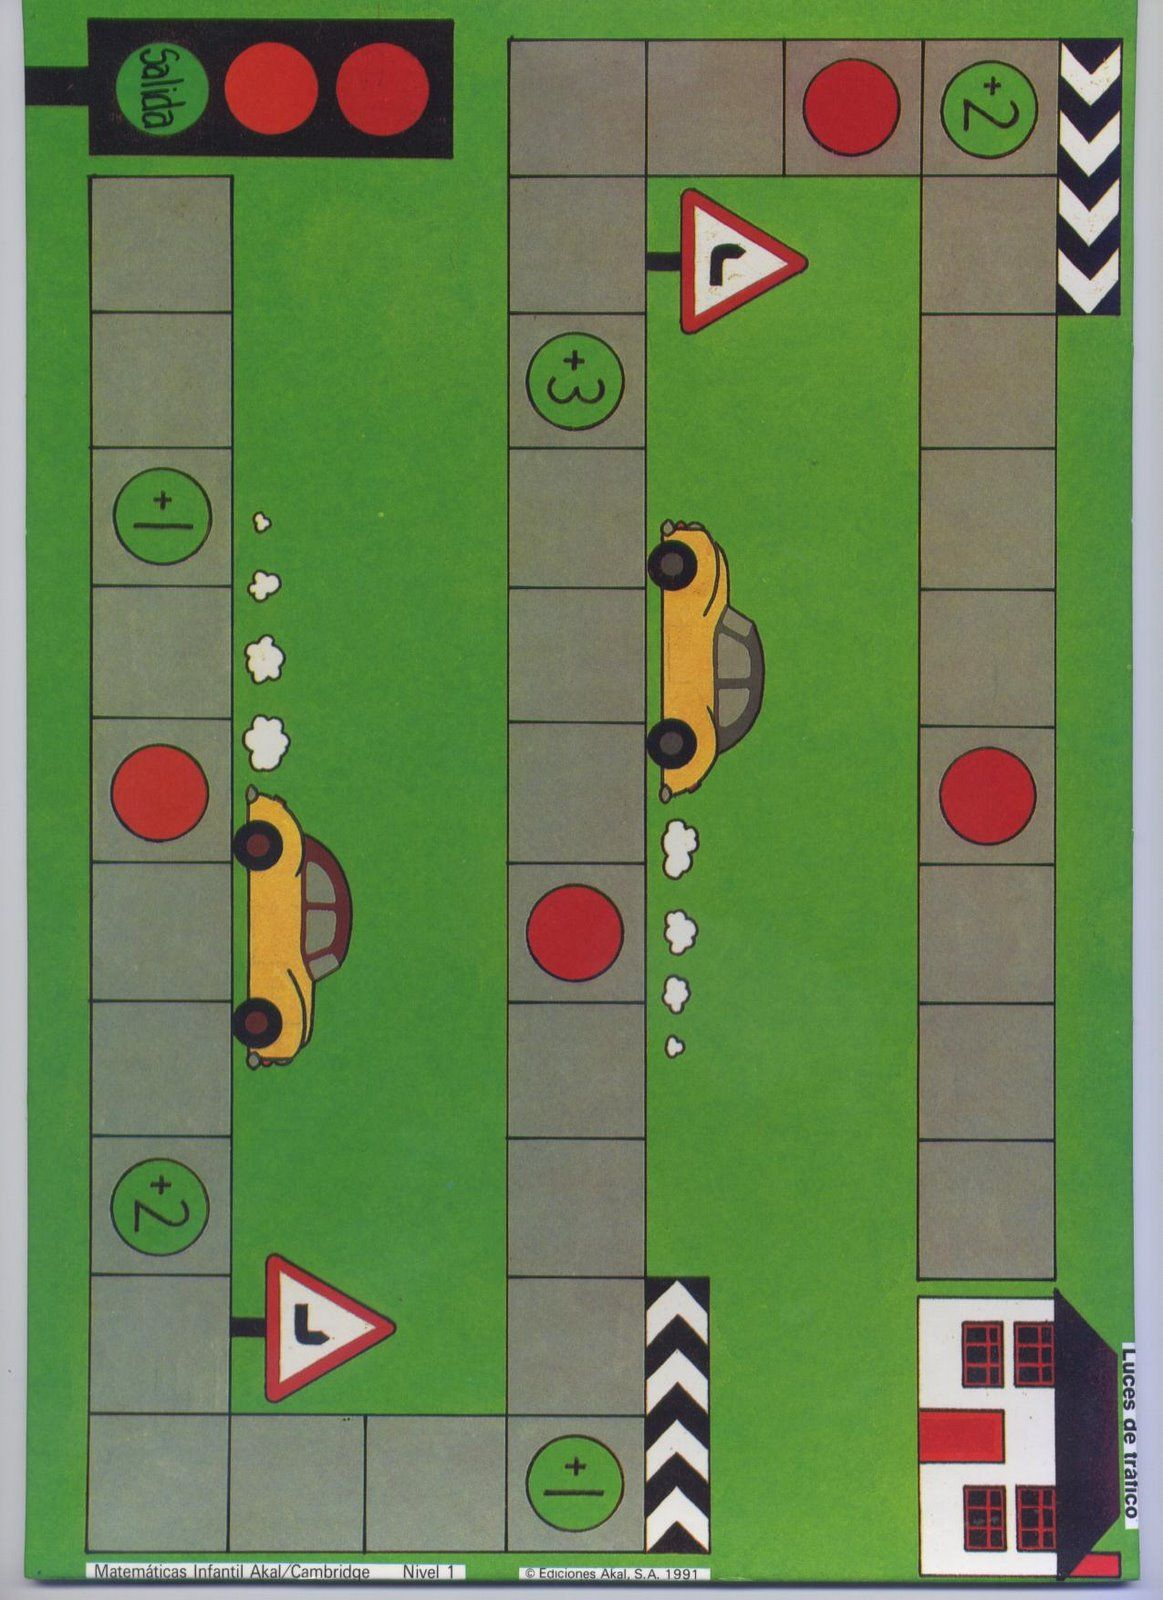 Juegos en color | play | Pinterest | Transportation theme, File ...